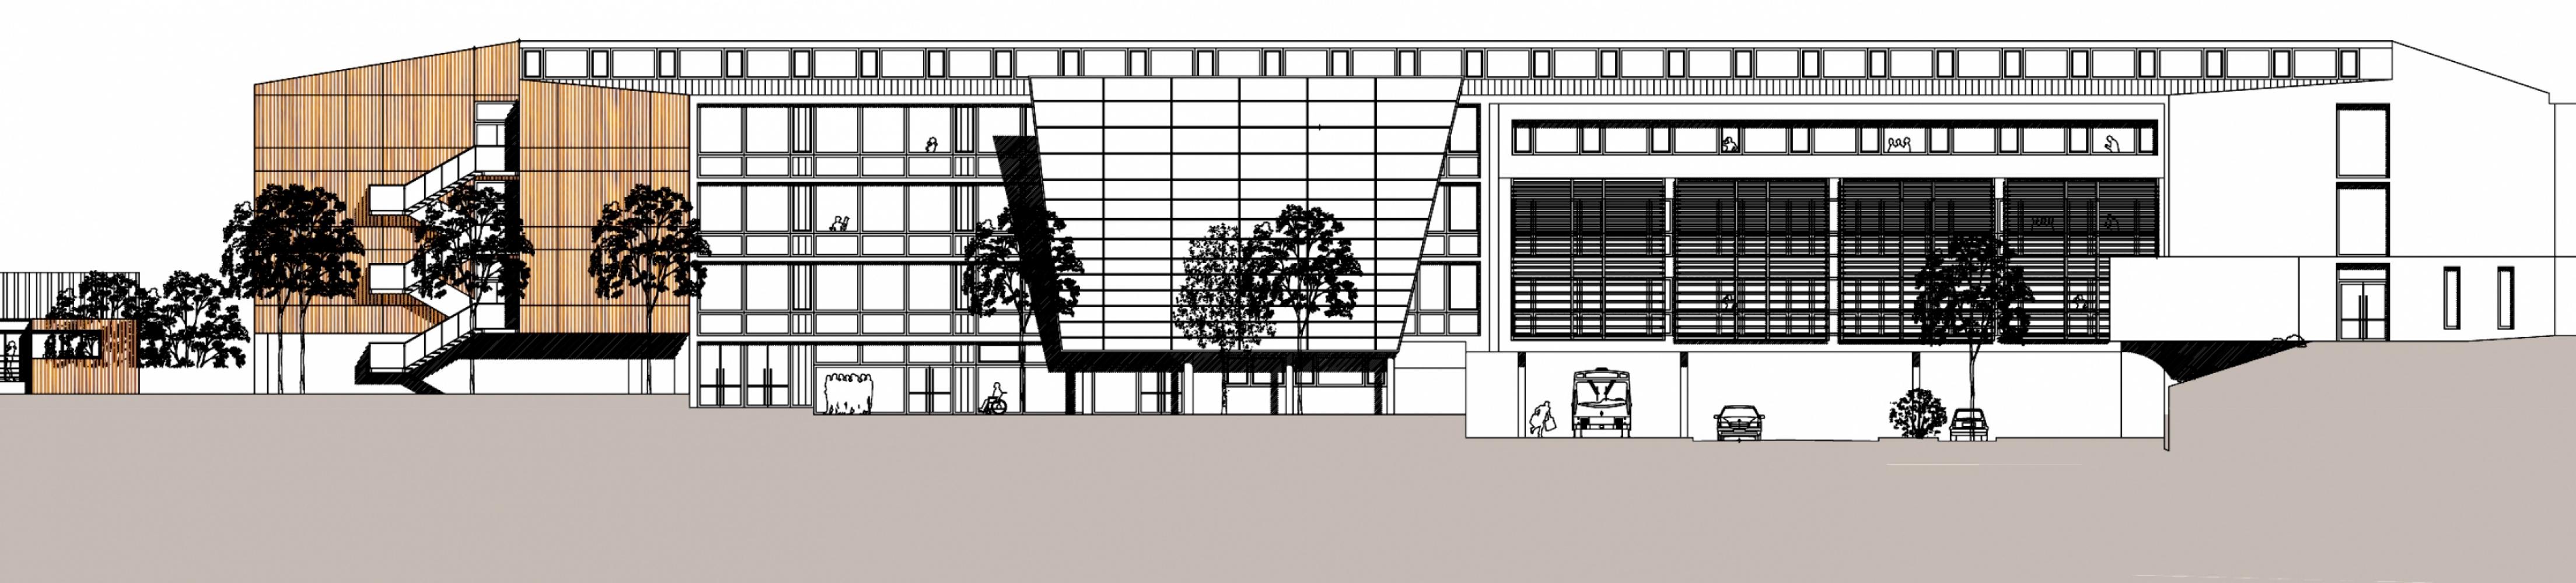 epernay03 Pascale SEURIN Architecte - Pascale SEURIN Architecte